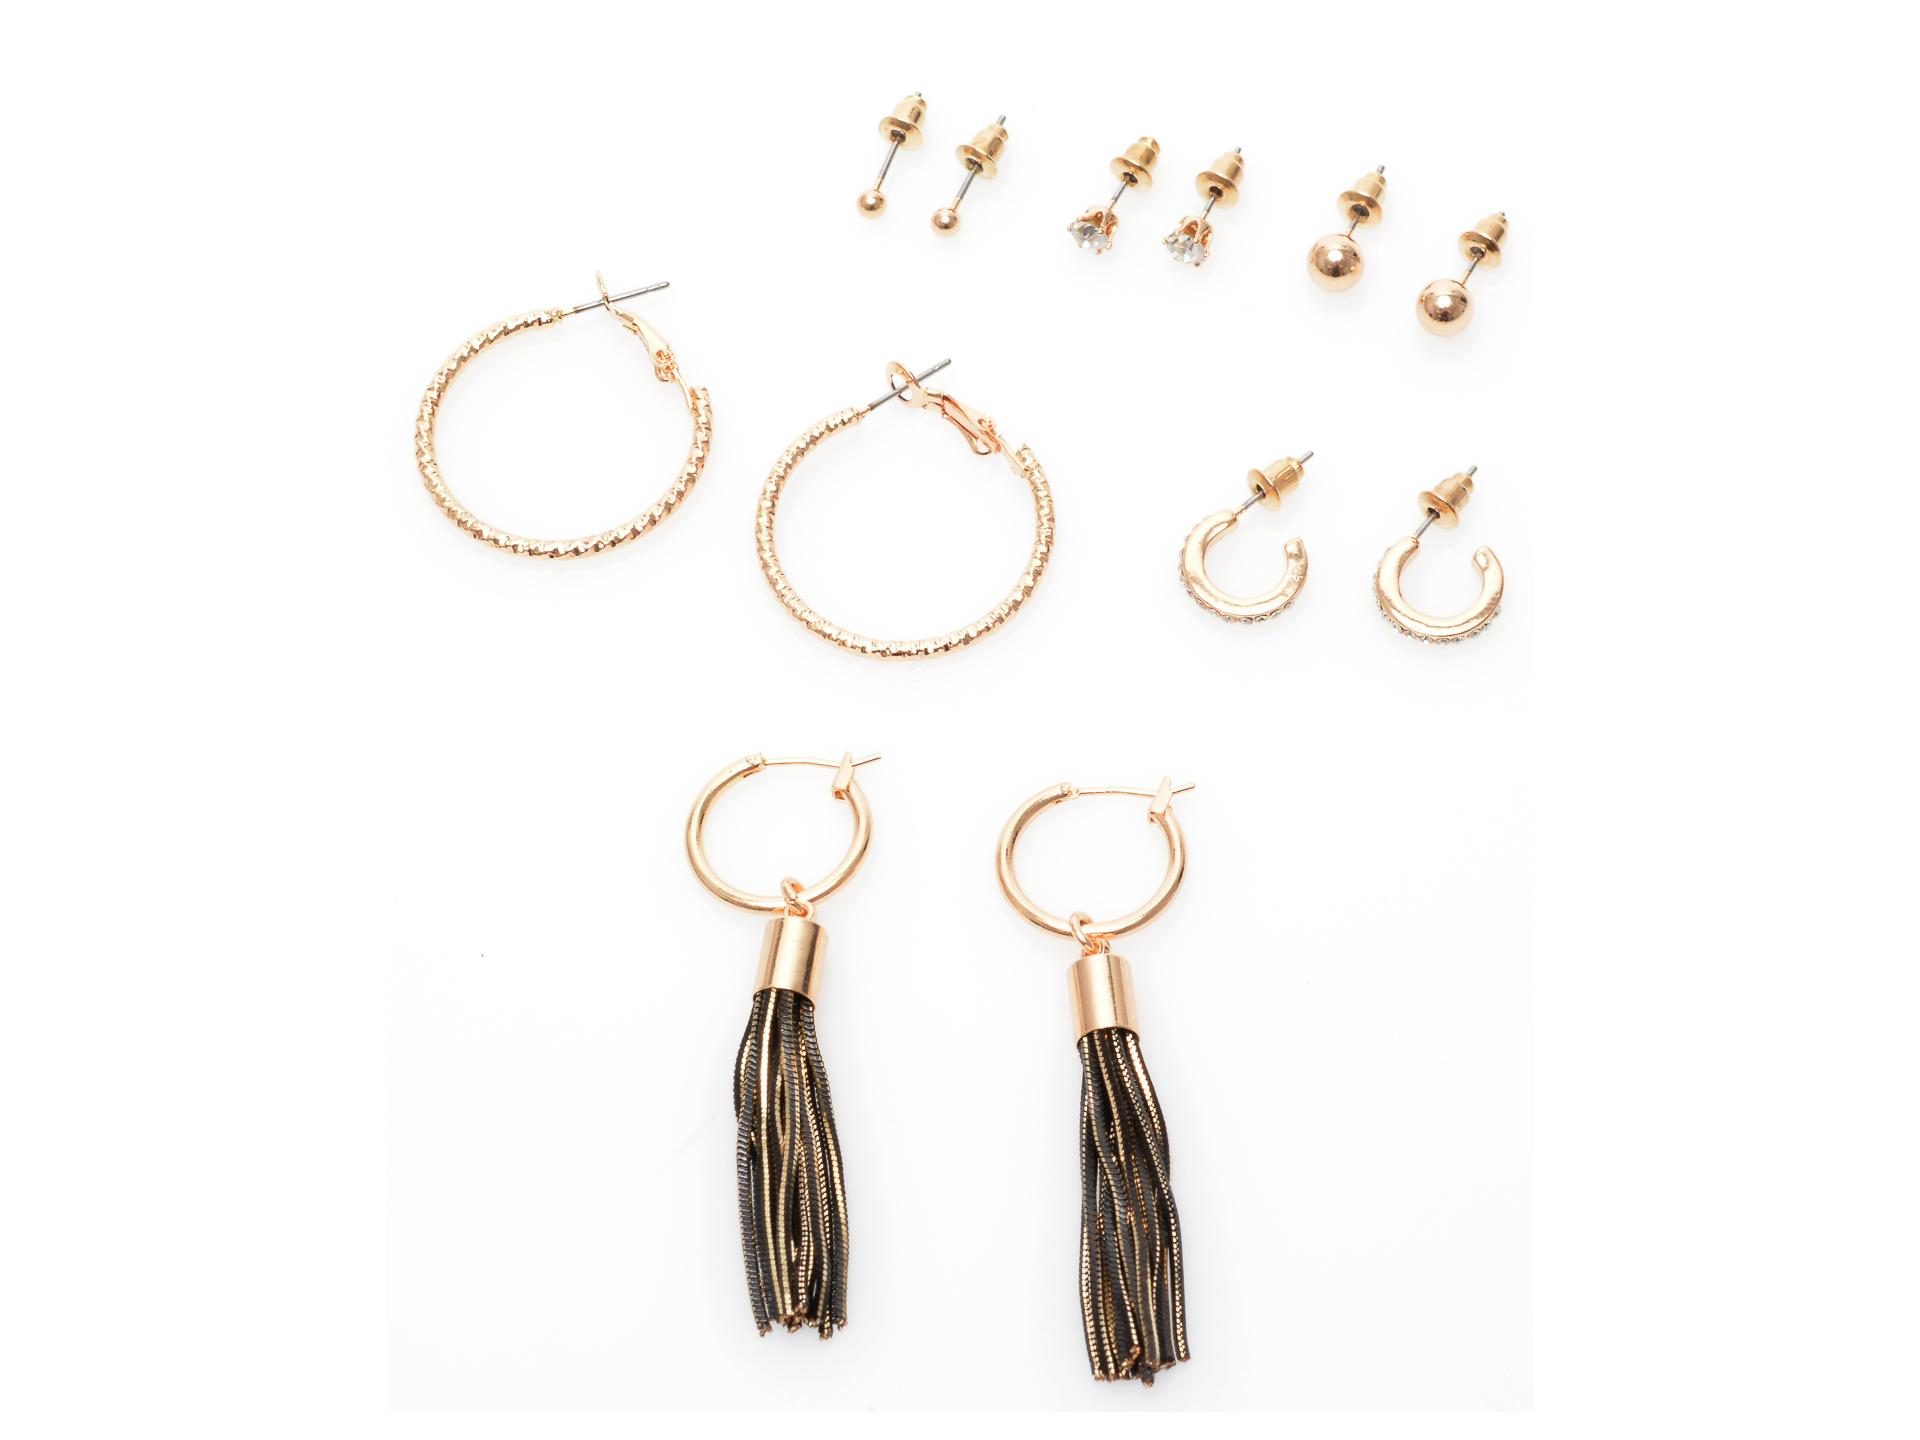 Cercei ALDO aurii, Lariravia970, din metal